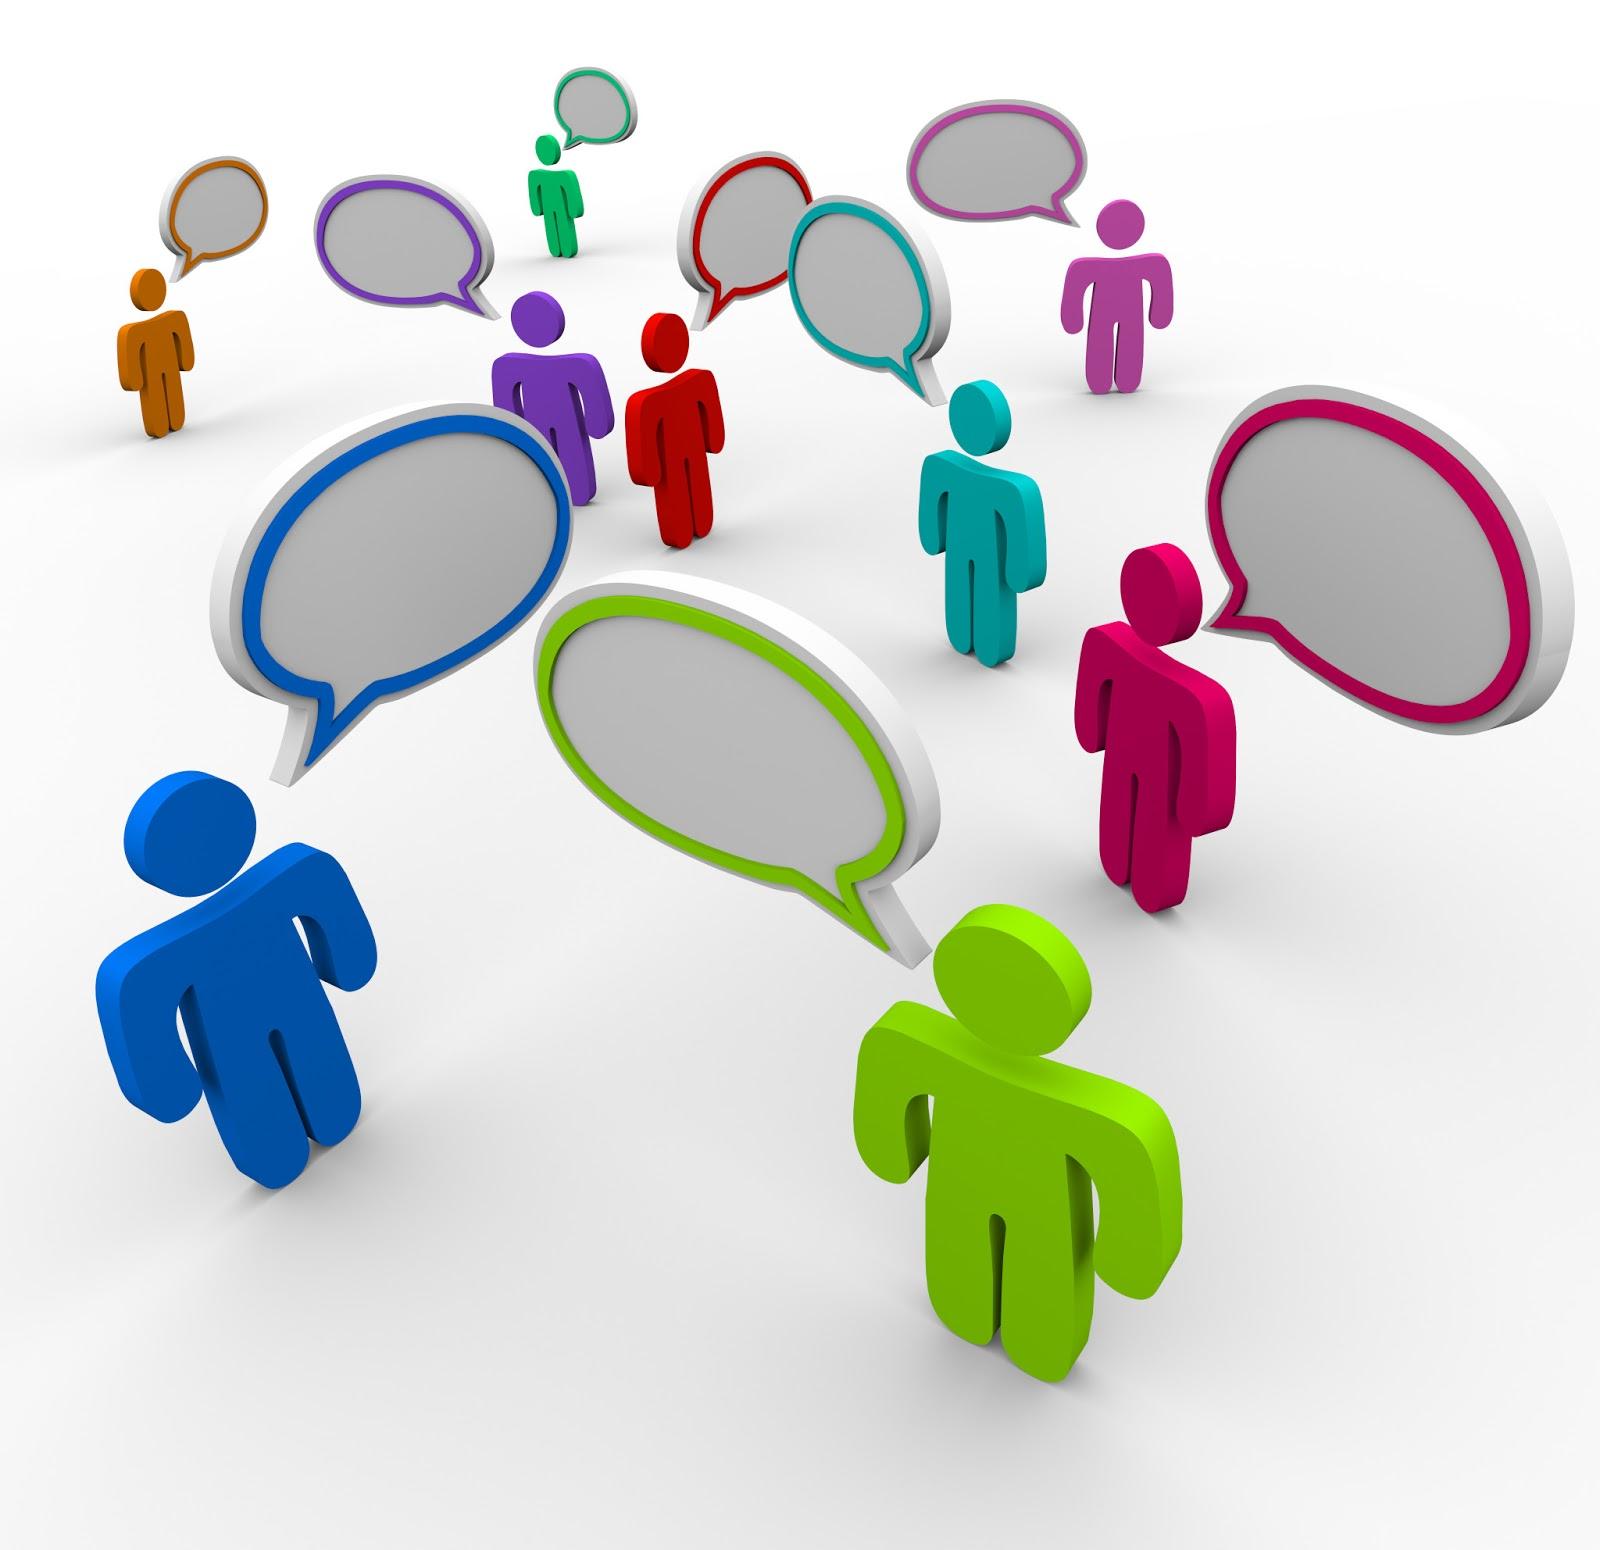 8 Habilidades sociales imprescindibles en Social Media